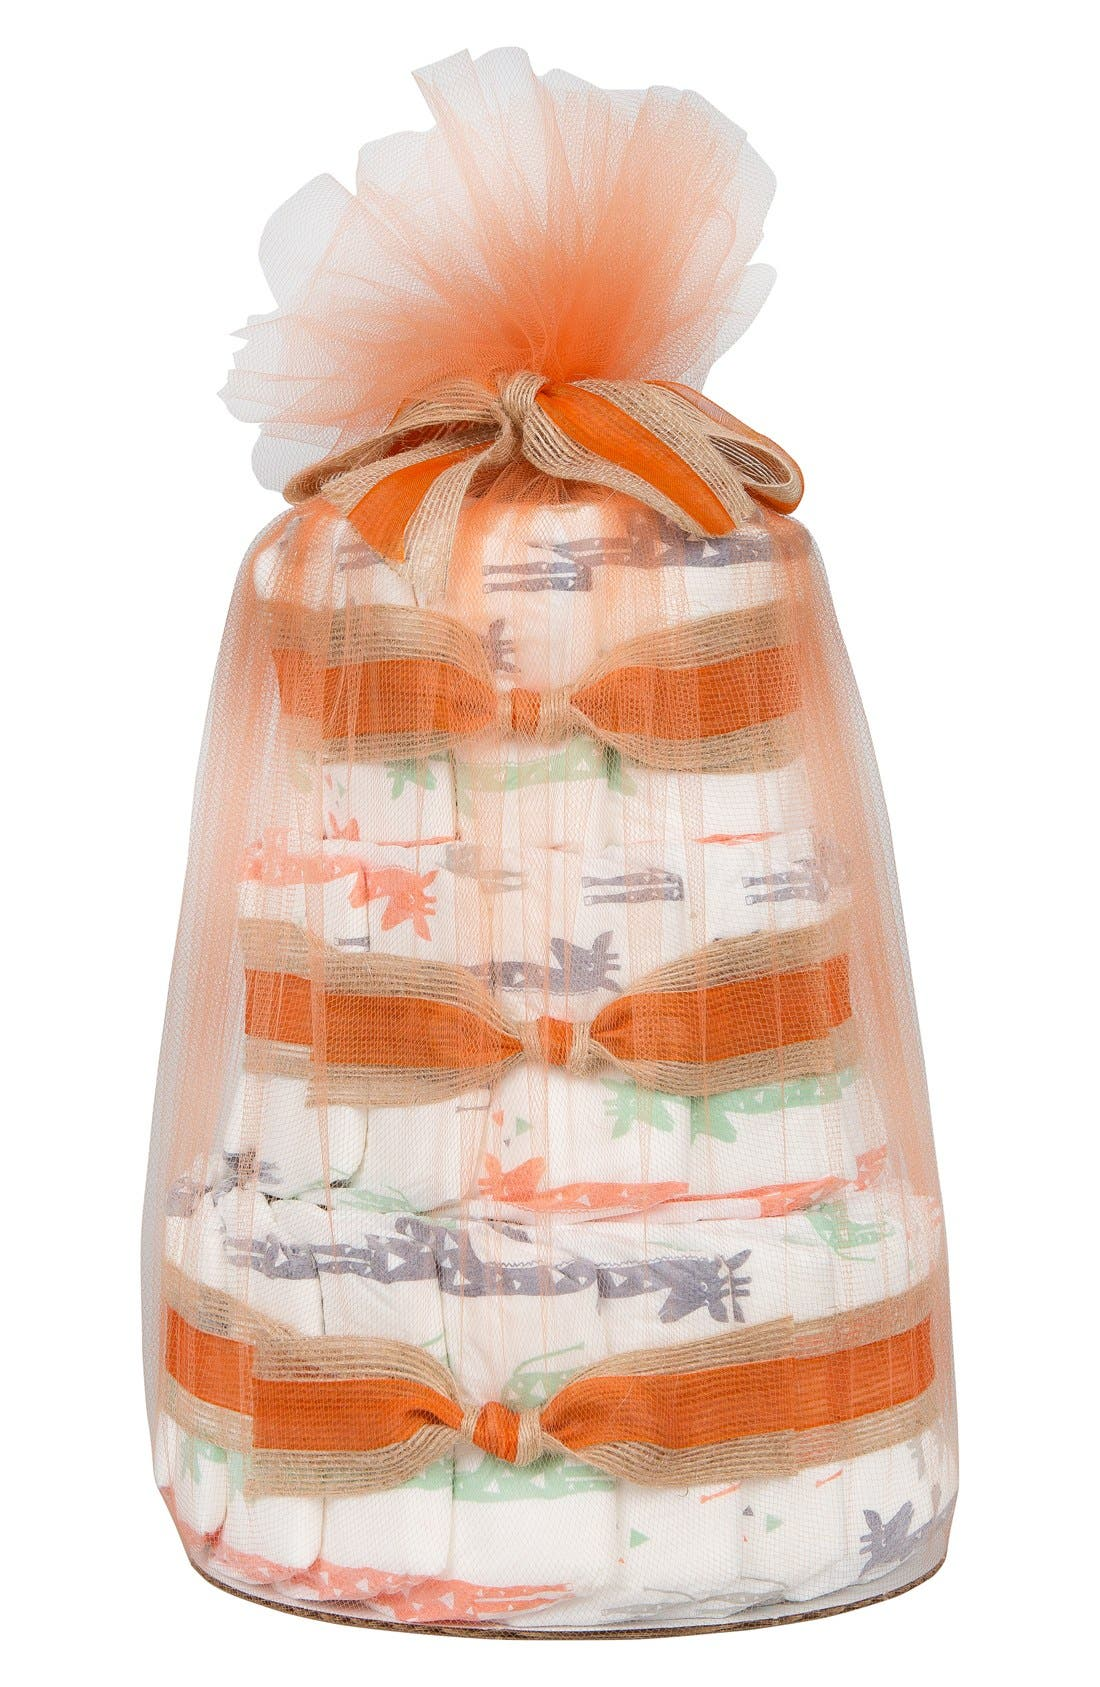 Mini Diaper Cake & Travel-Size Essentials Set,                         Main,                         color,